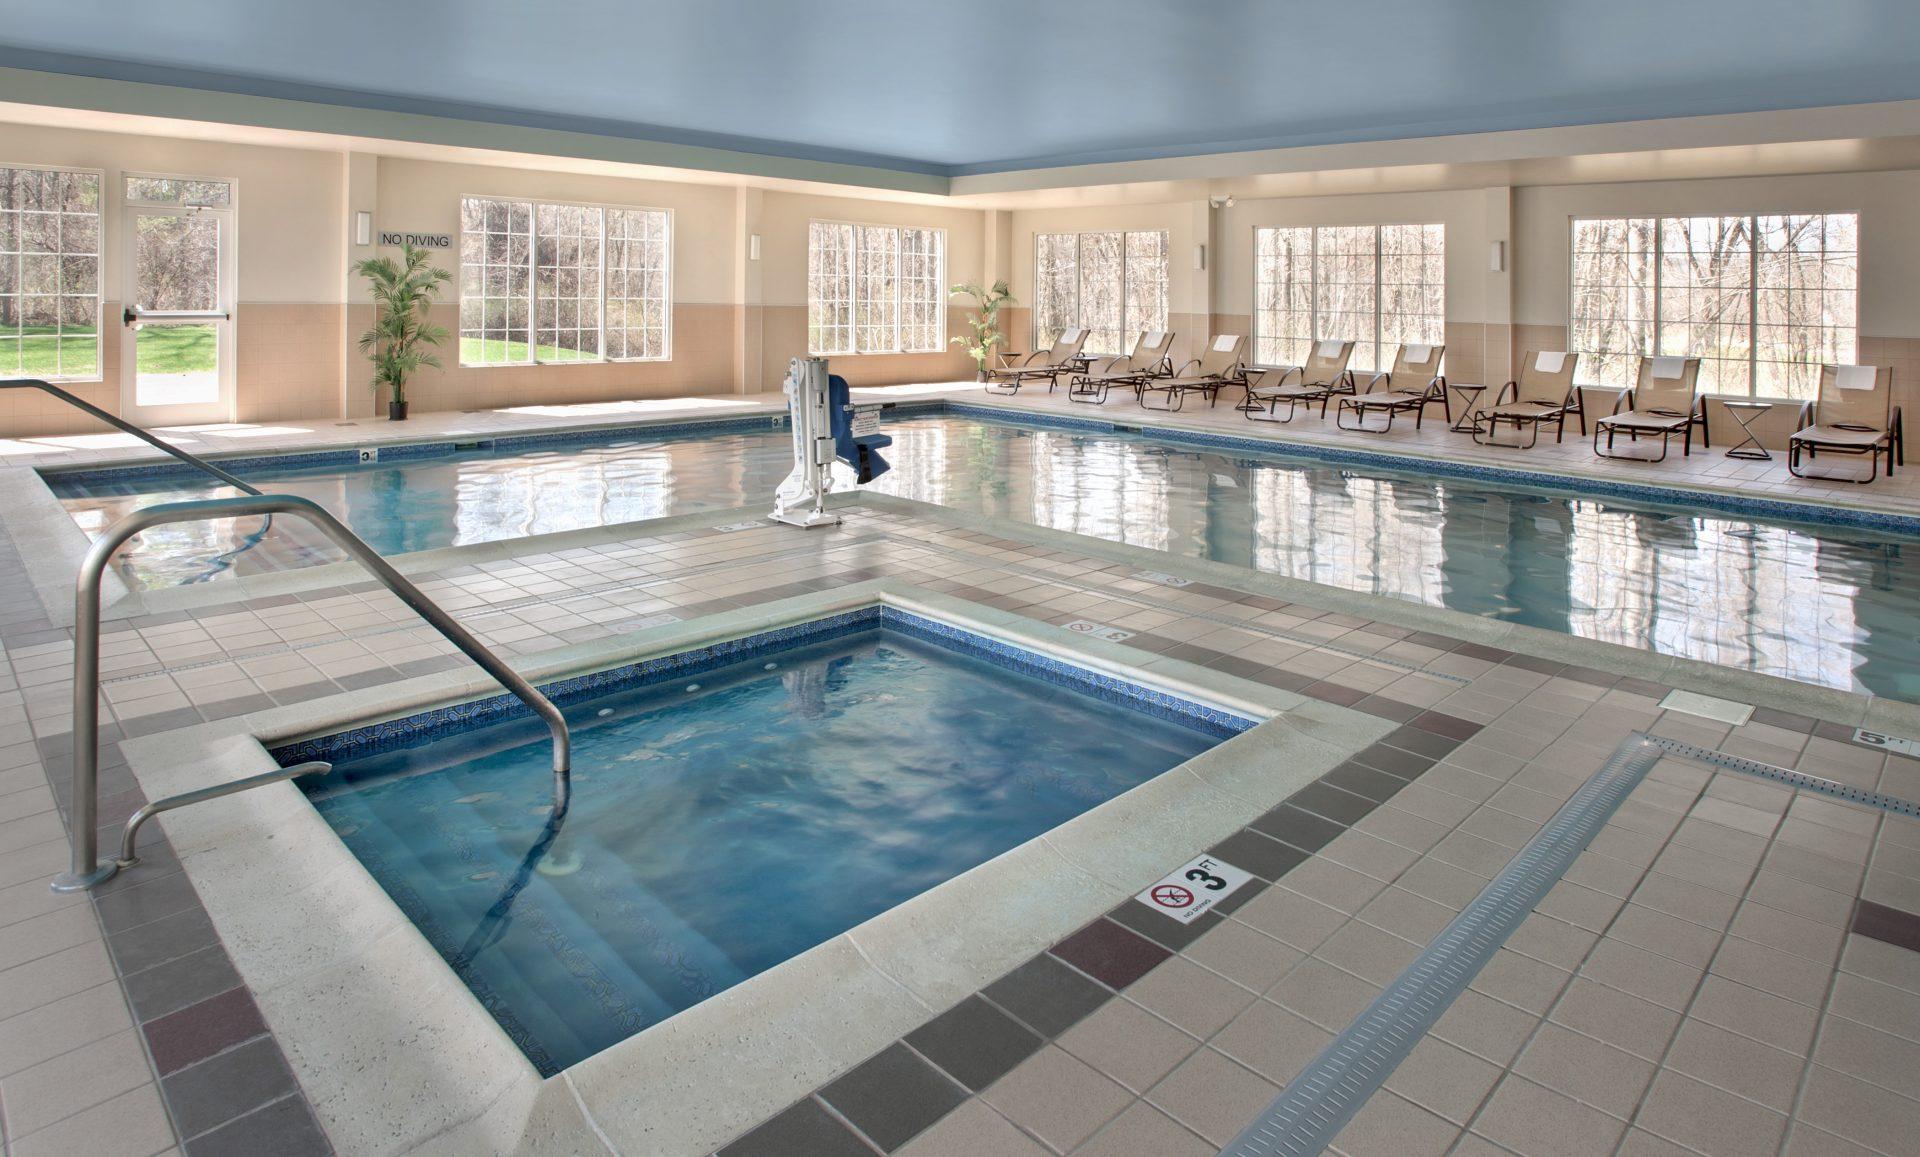 Accommodations in the Berkshires - B&Bs – Inns - Restaurants